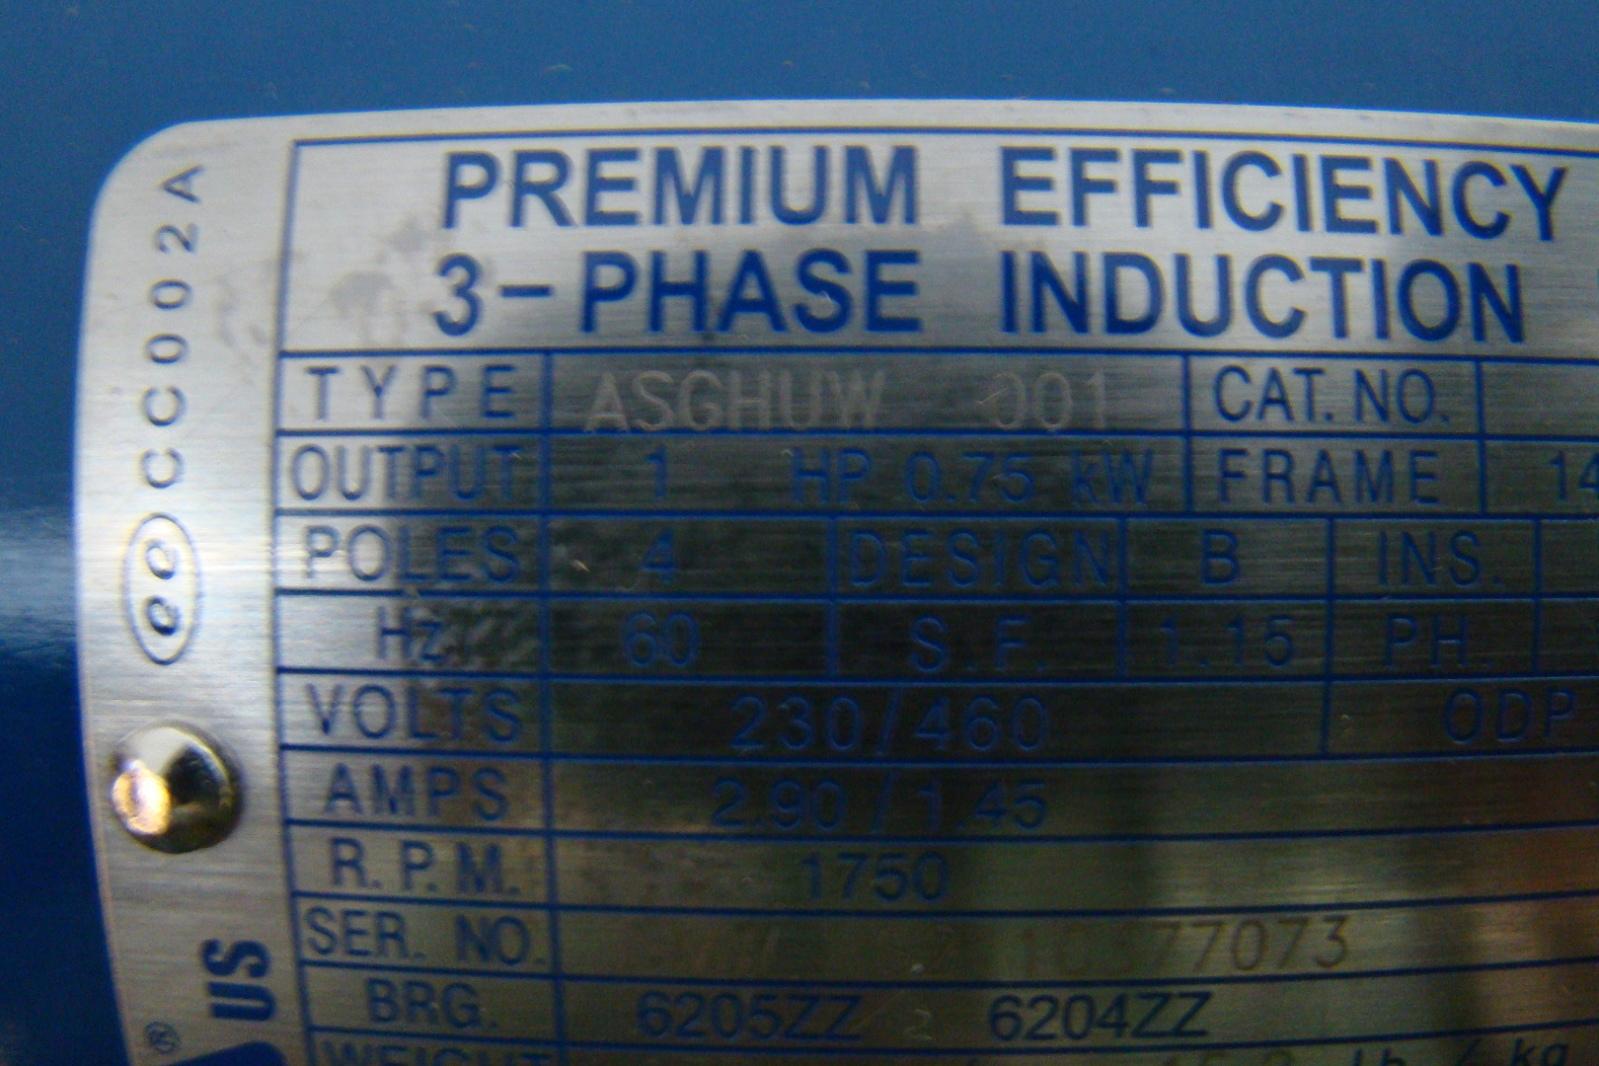 Premium Efficiency 1 Hp 230 460v Induction Motor Dtp0014